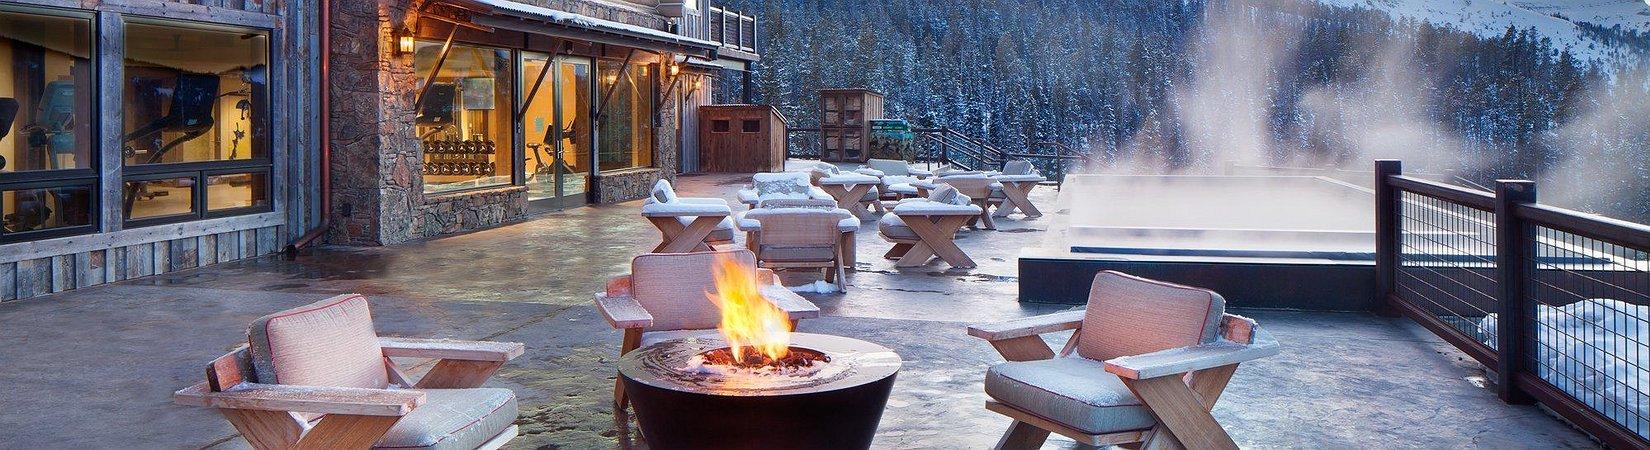 Yellowstone Club, o clube privado onde Bill Gates e Justin Timberlake praticam ski